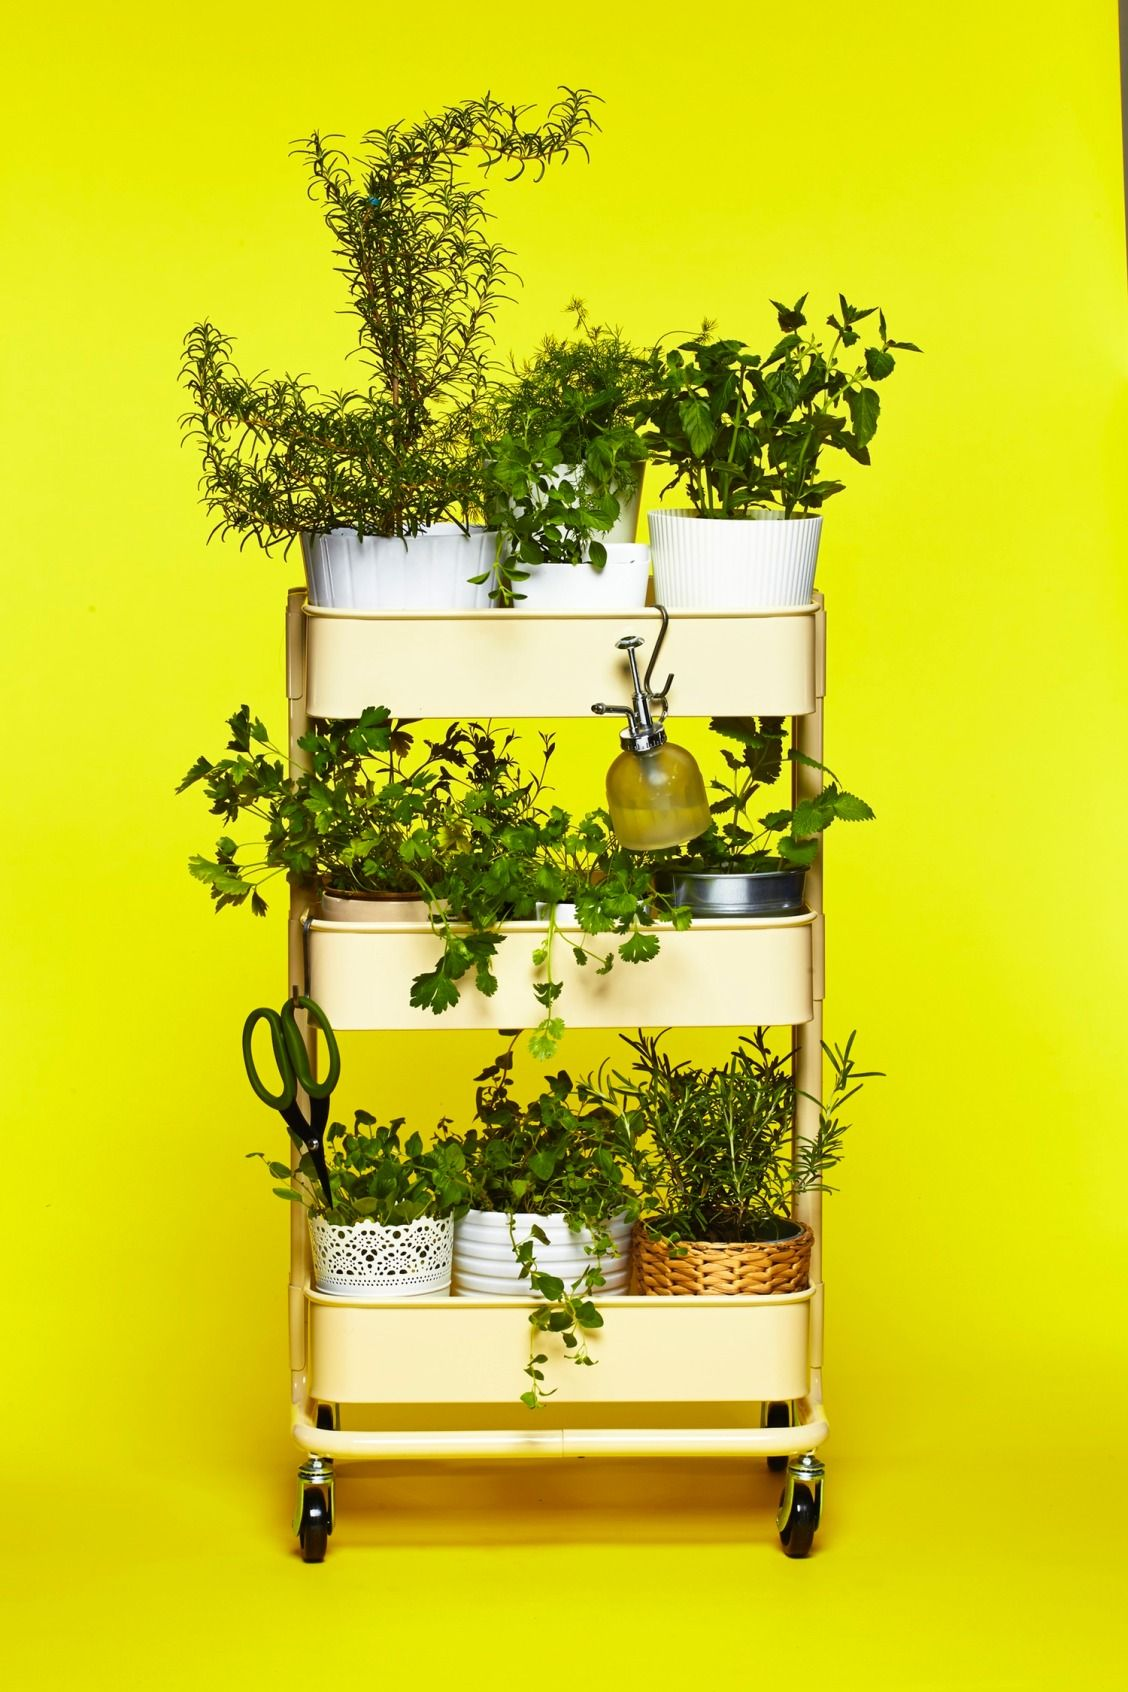 the ikea r skog cart as herb garden diy projects for. Black Bedroom Furniture Sets. Home Design Ideas